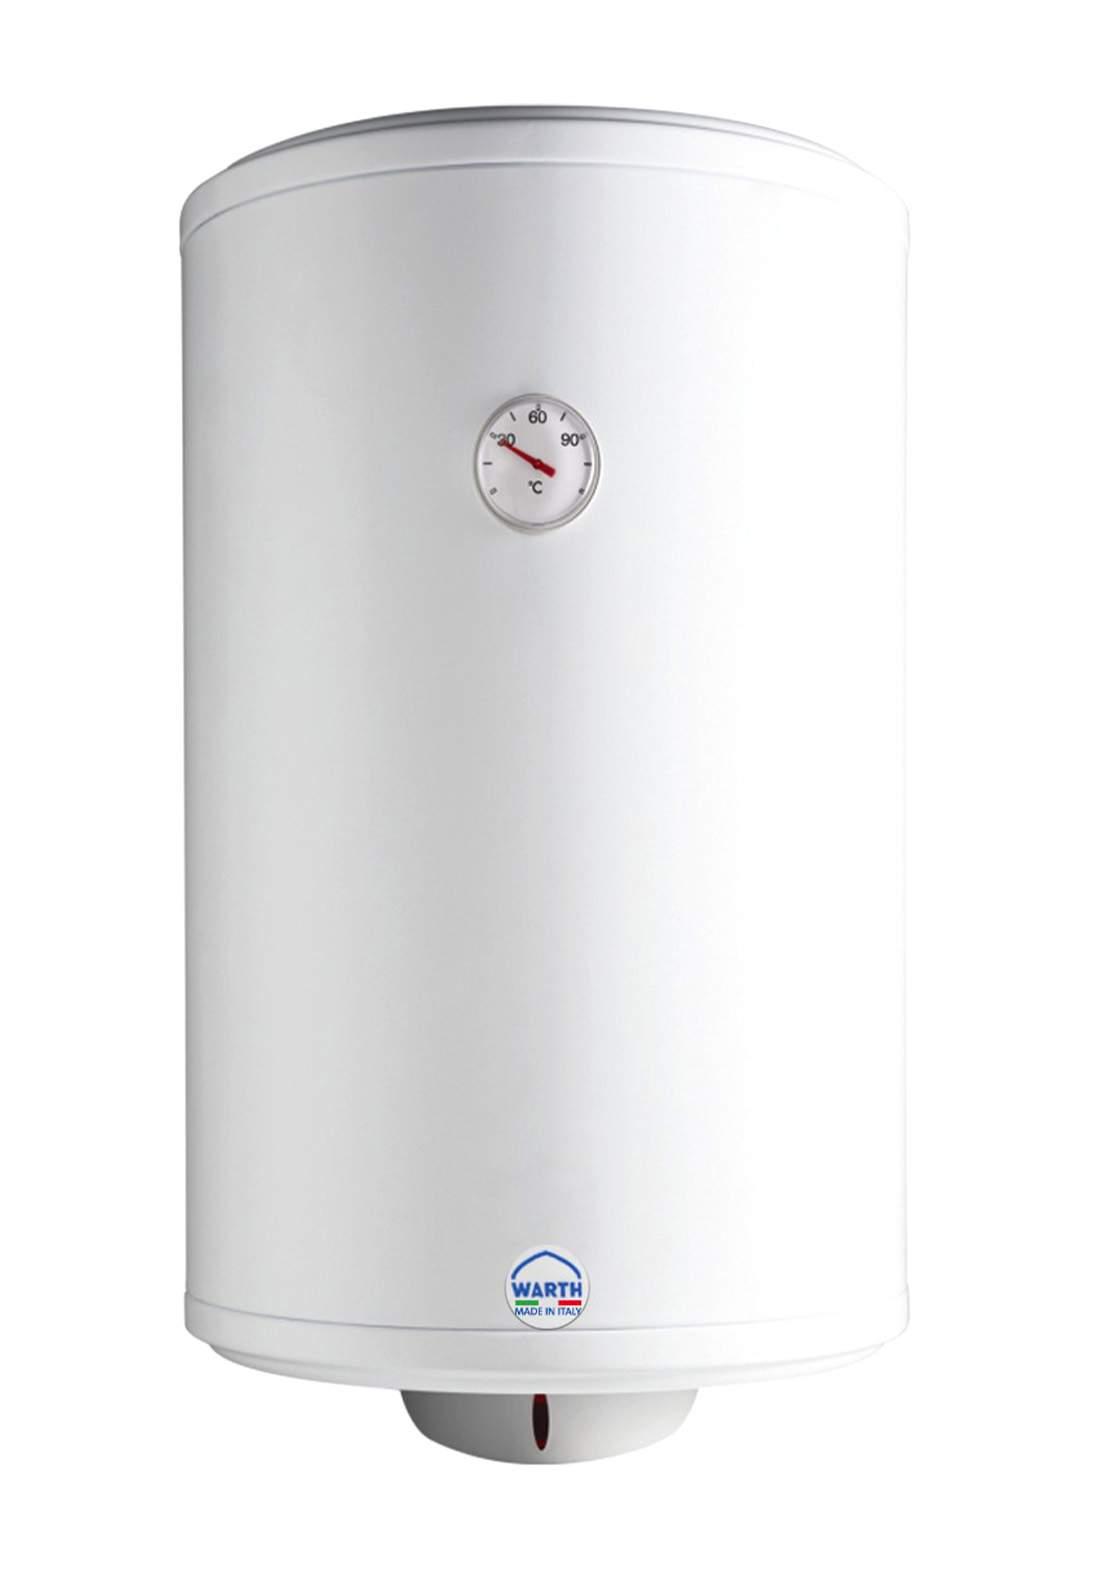 Warth WH-80 Water Heater سخان المياه 80 لتر